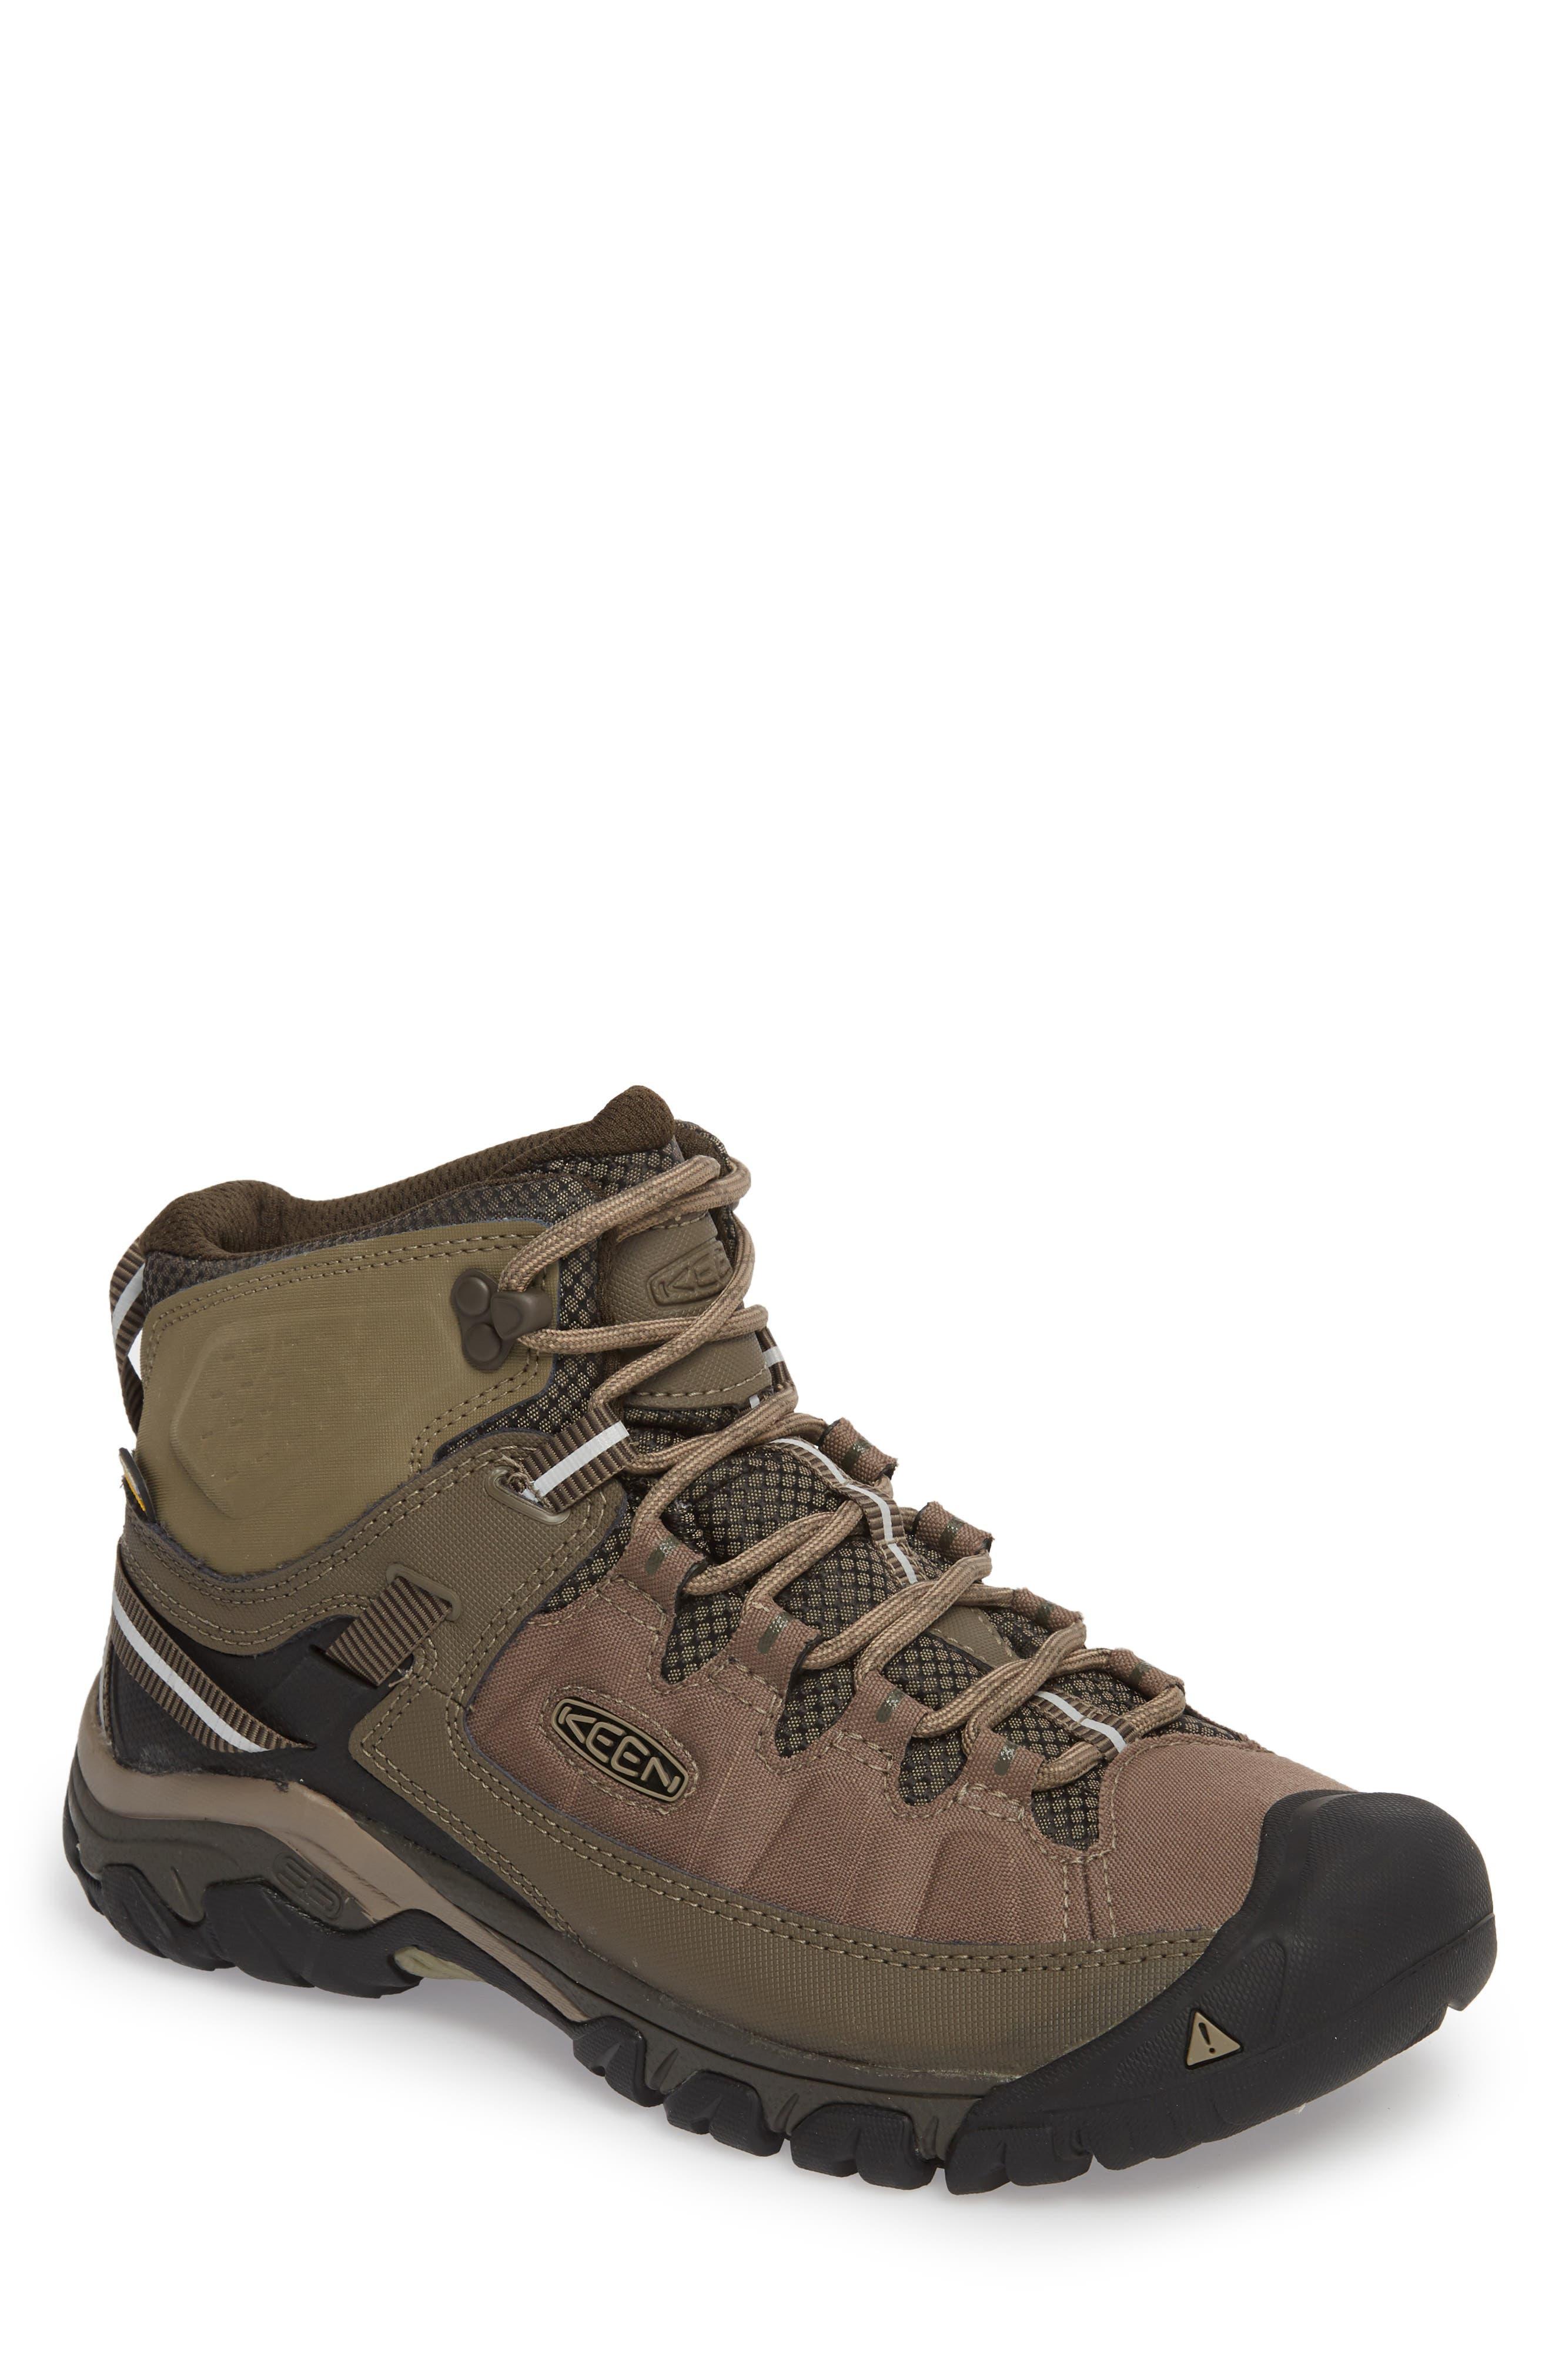 KEEN, Targhee EXP Mid Waterproof Hiking Boot, Main thumbnail 1, color, BUNGEE CORD/BRINDLE